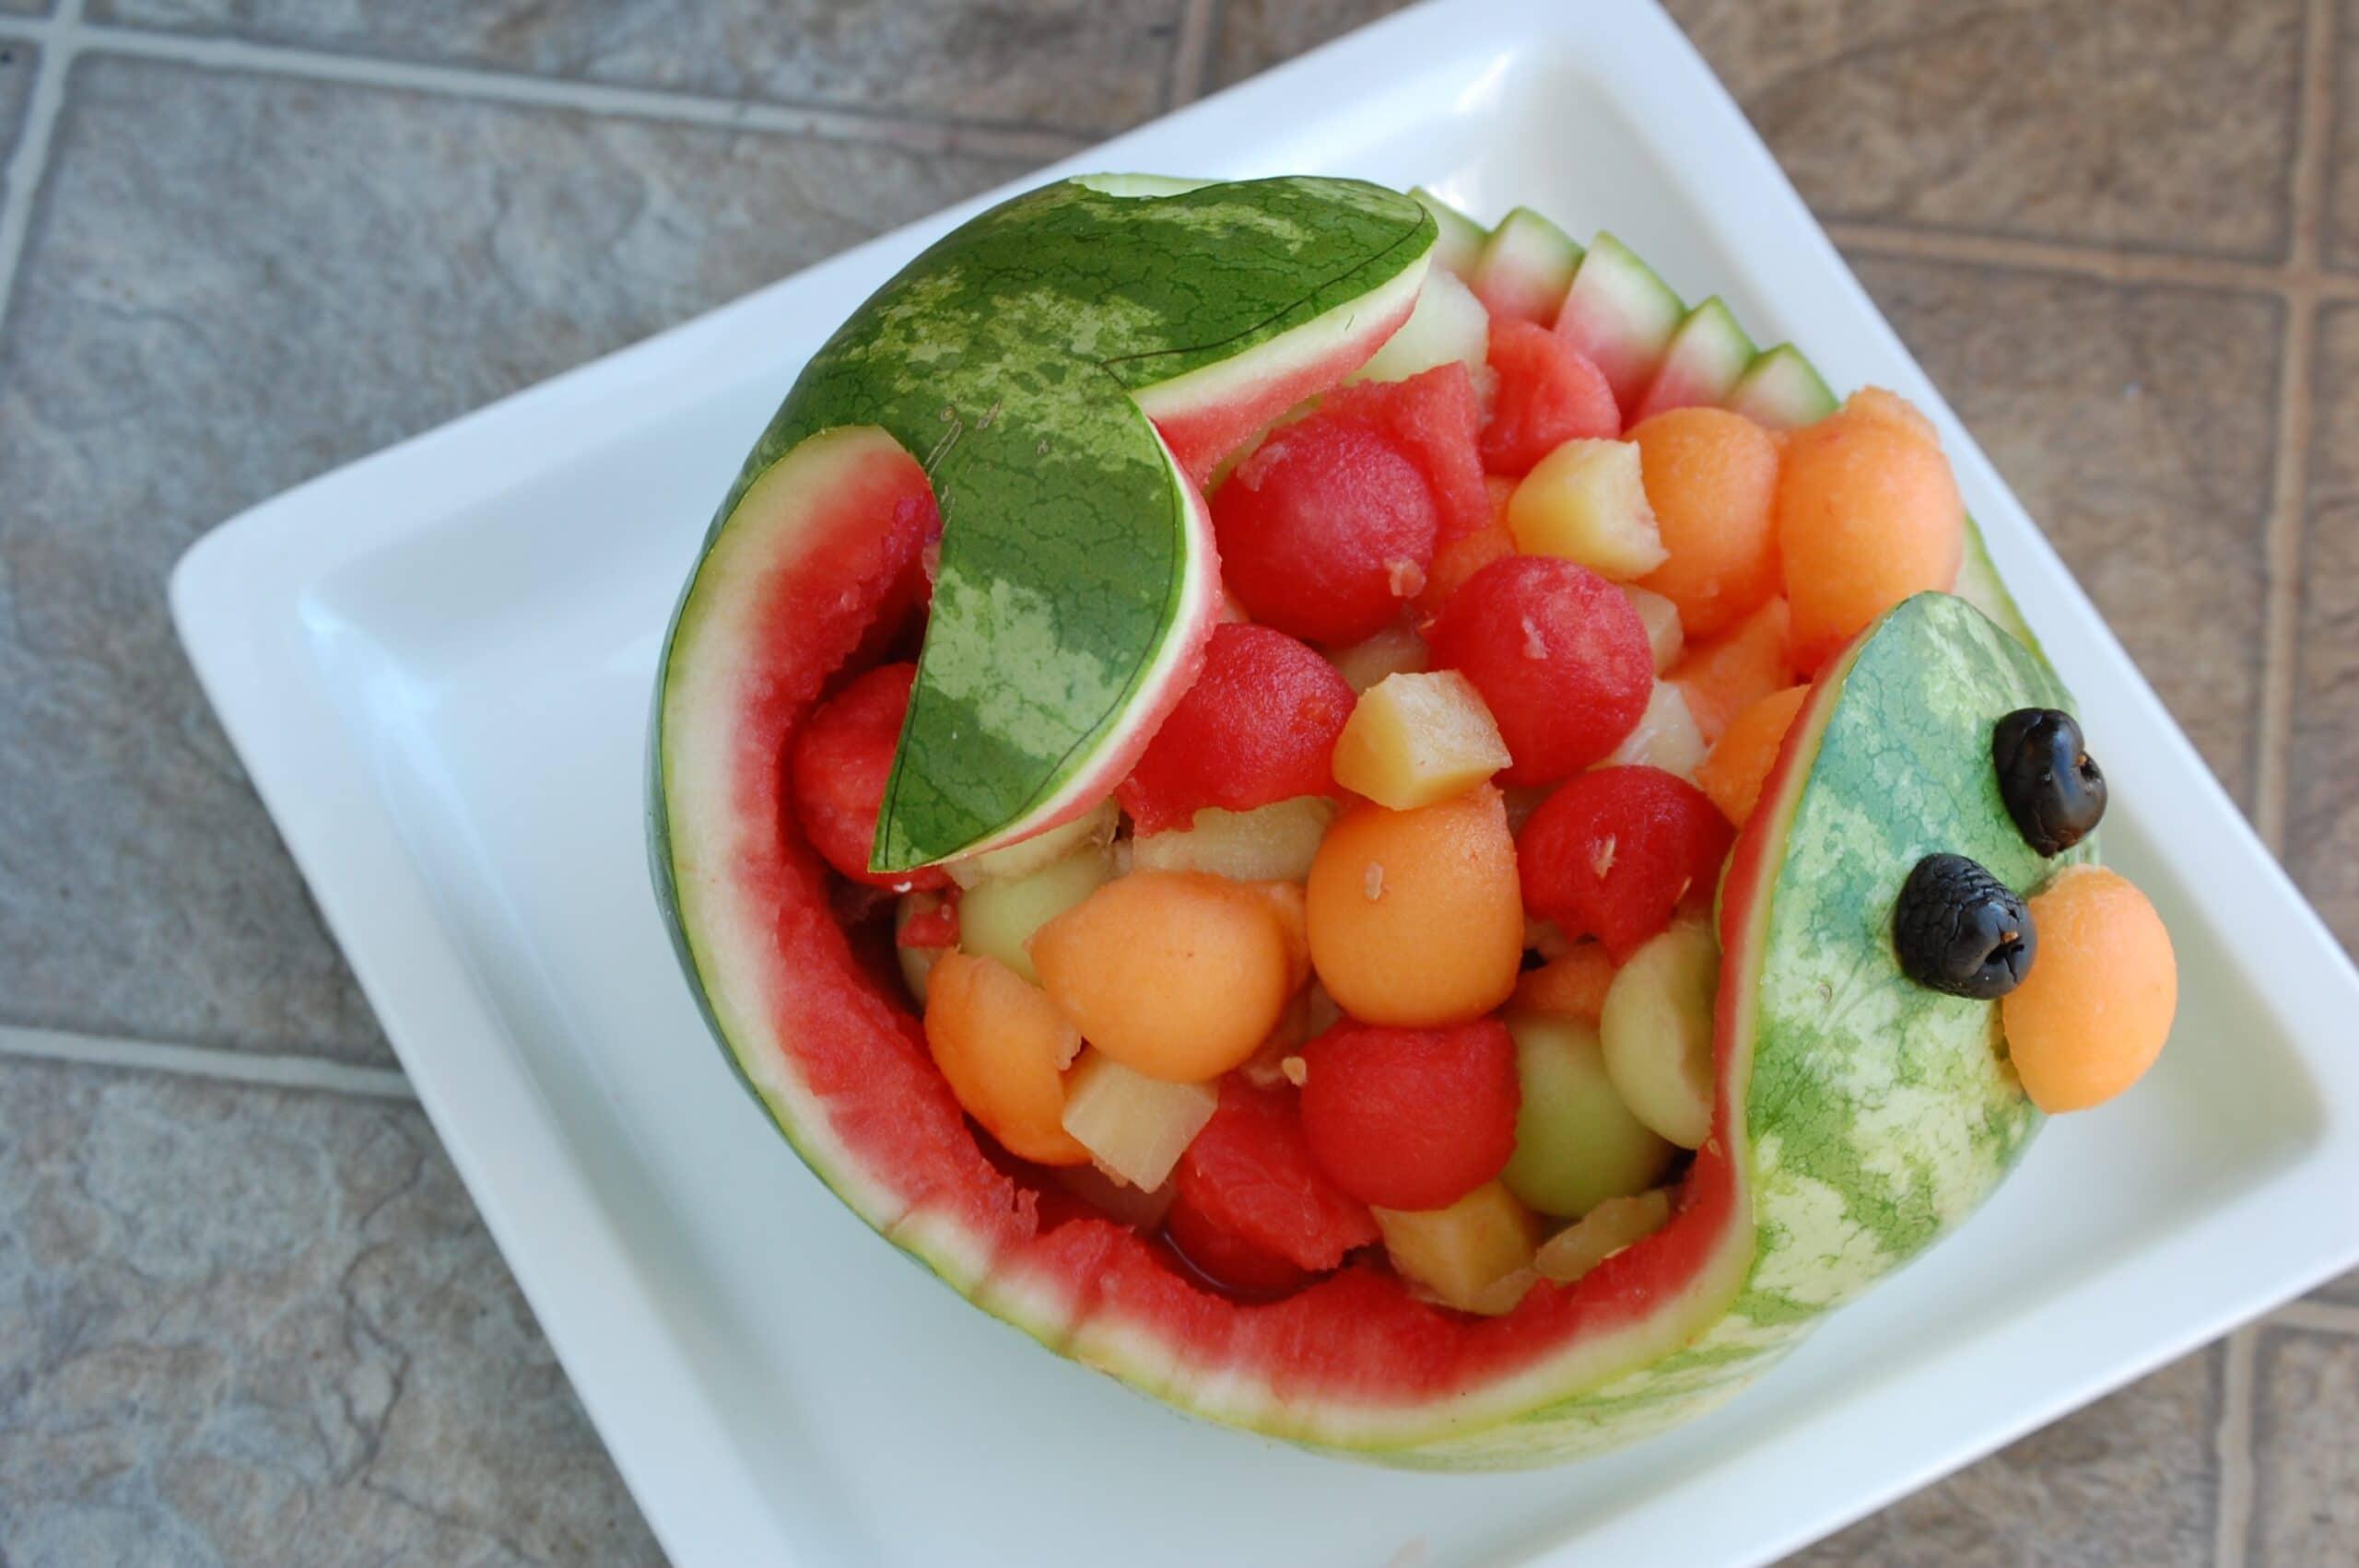 The Watermelon Whale Super Healthy Kids